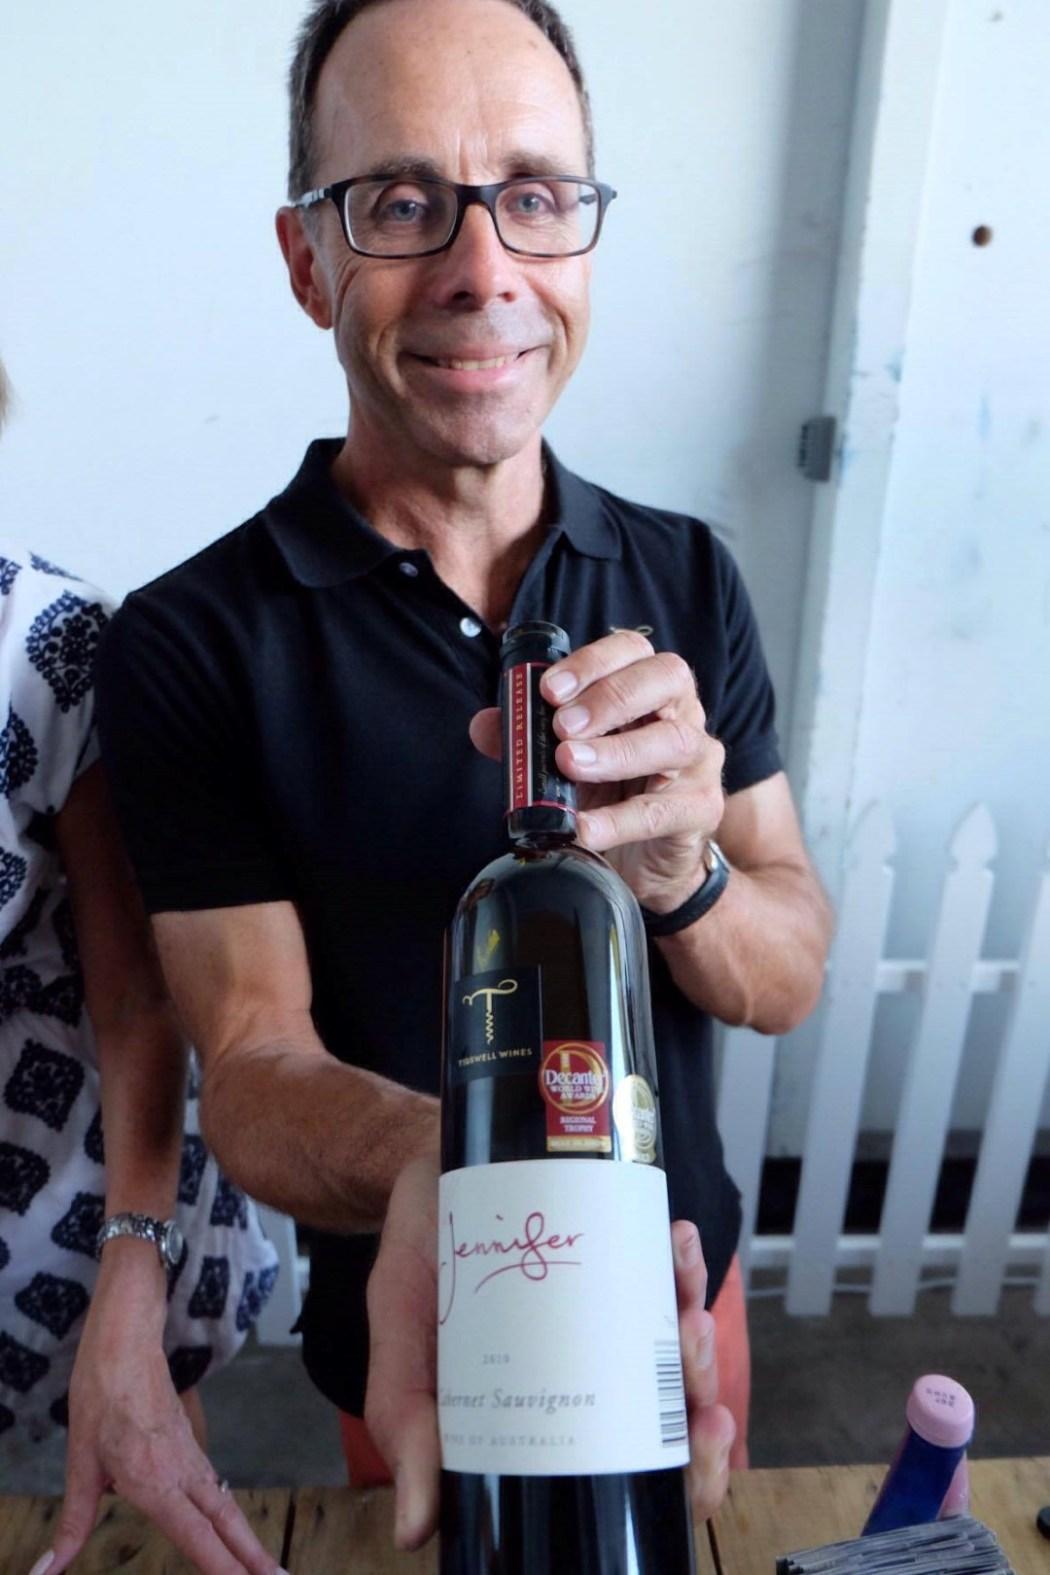 'Jennifer' Cabernet Sauvignon Tidswell Wines